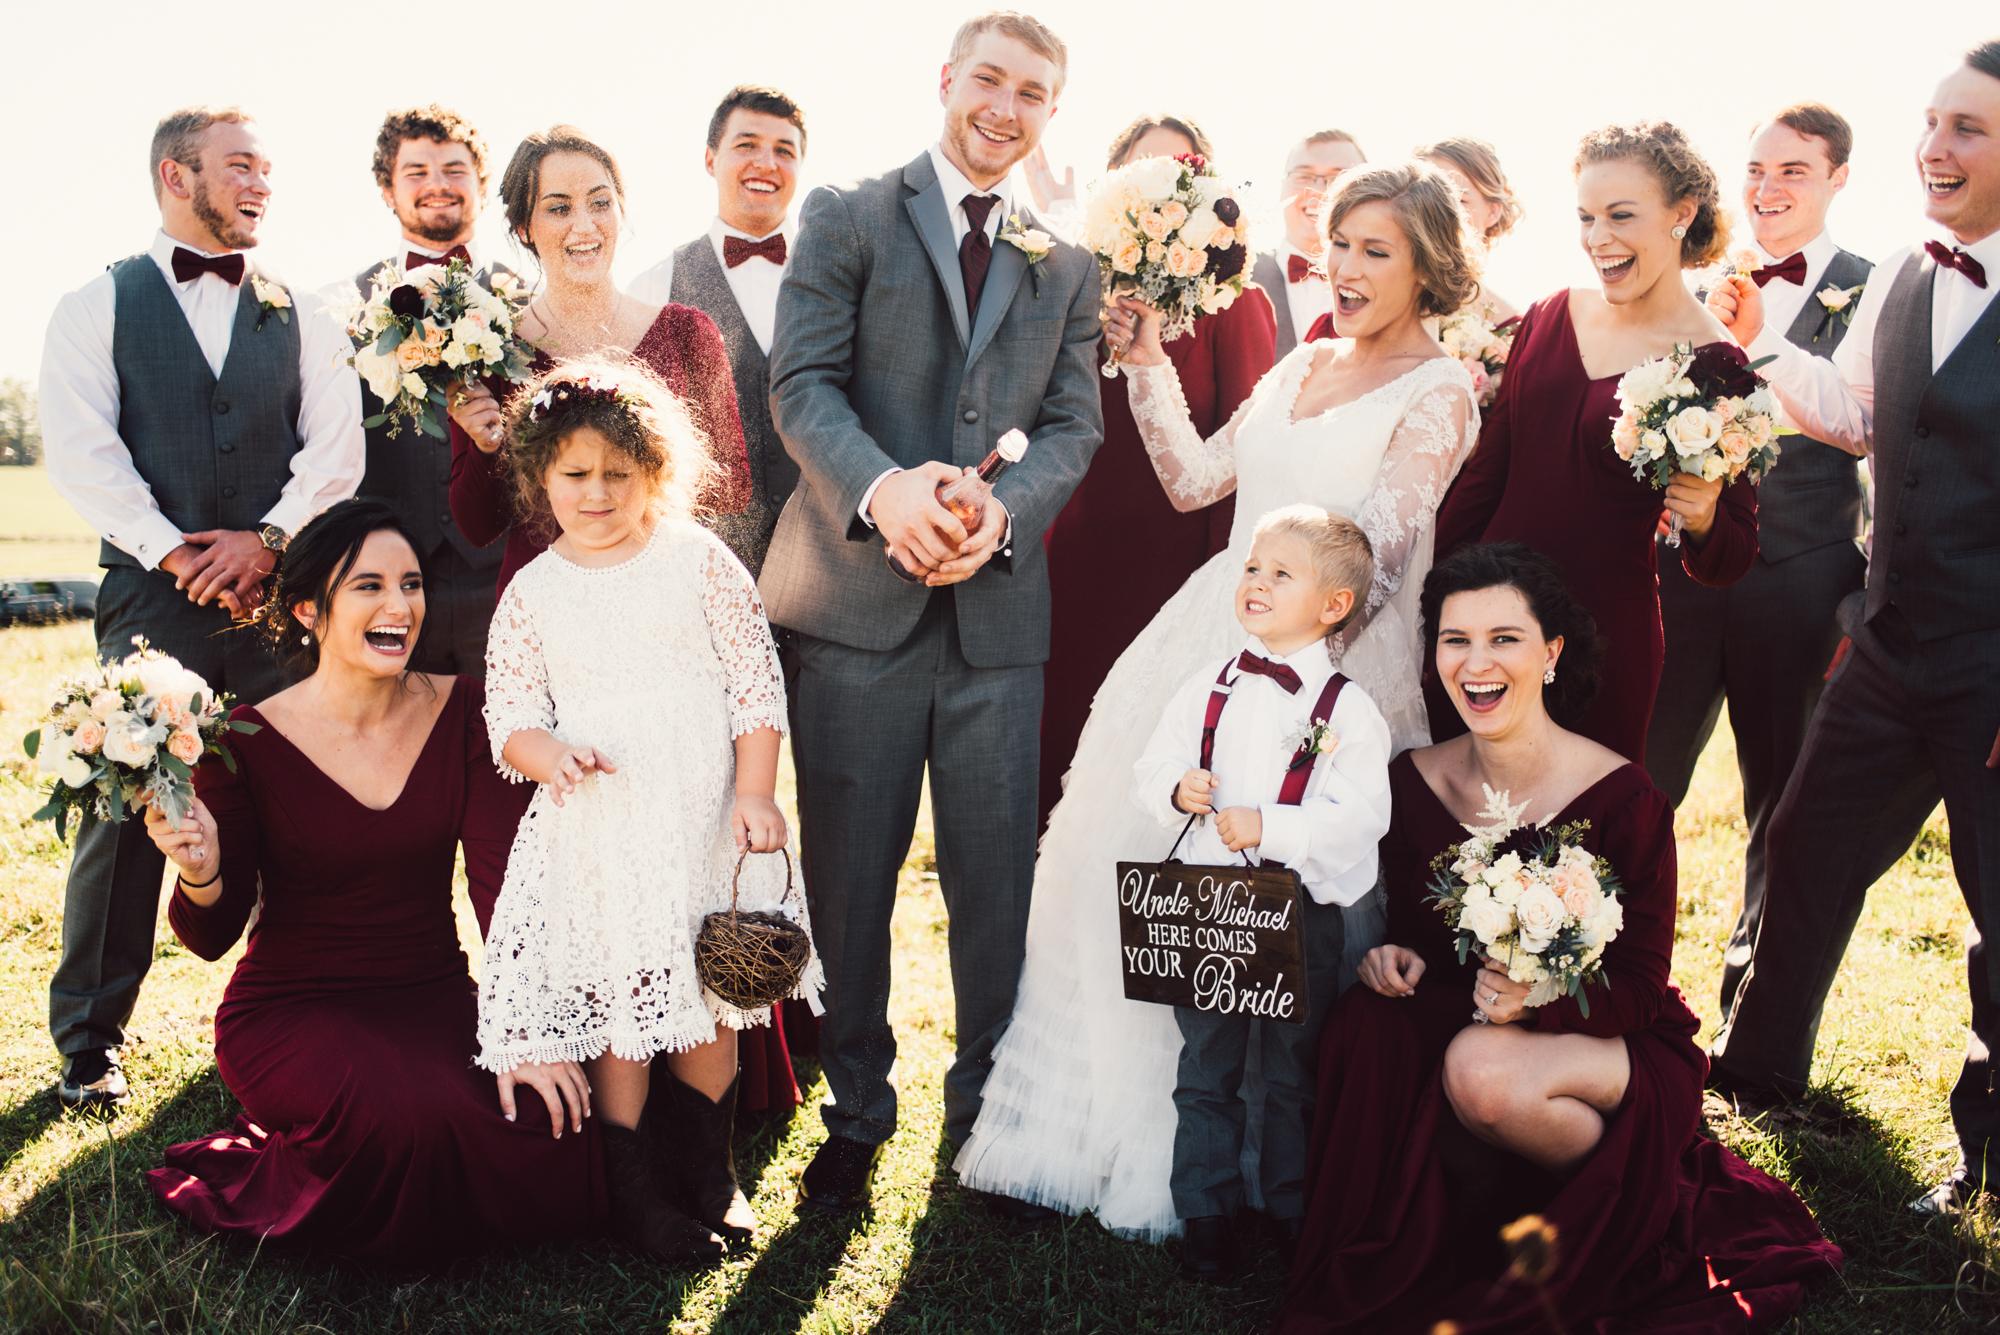 Ashley-and-Michael-Beaune-Woodstock-Virginia-Wedding-Shenandoah-Valley_68.JPG